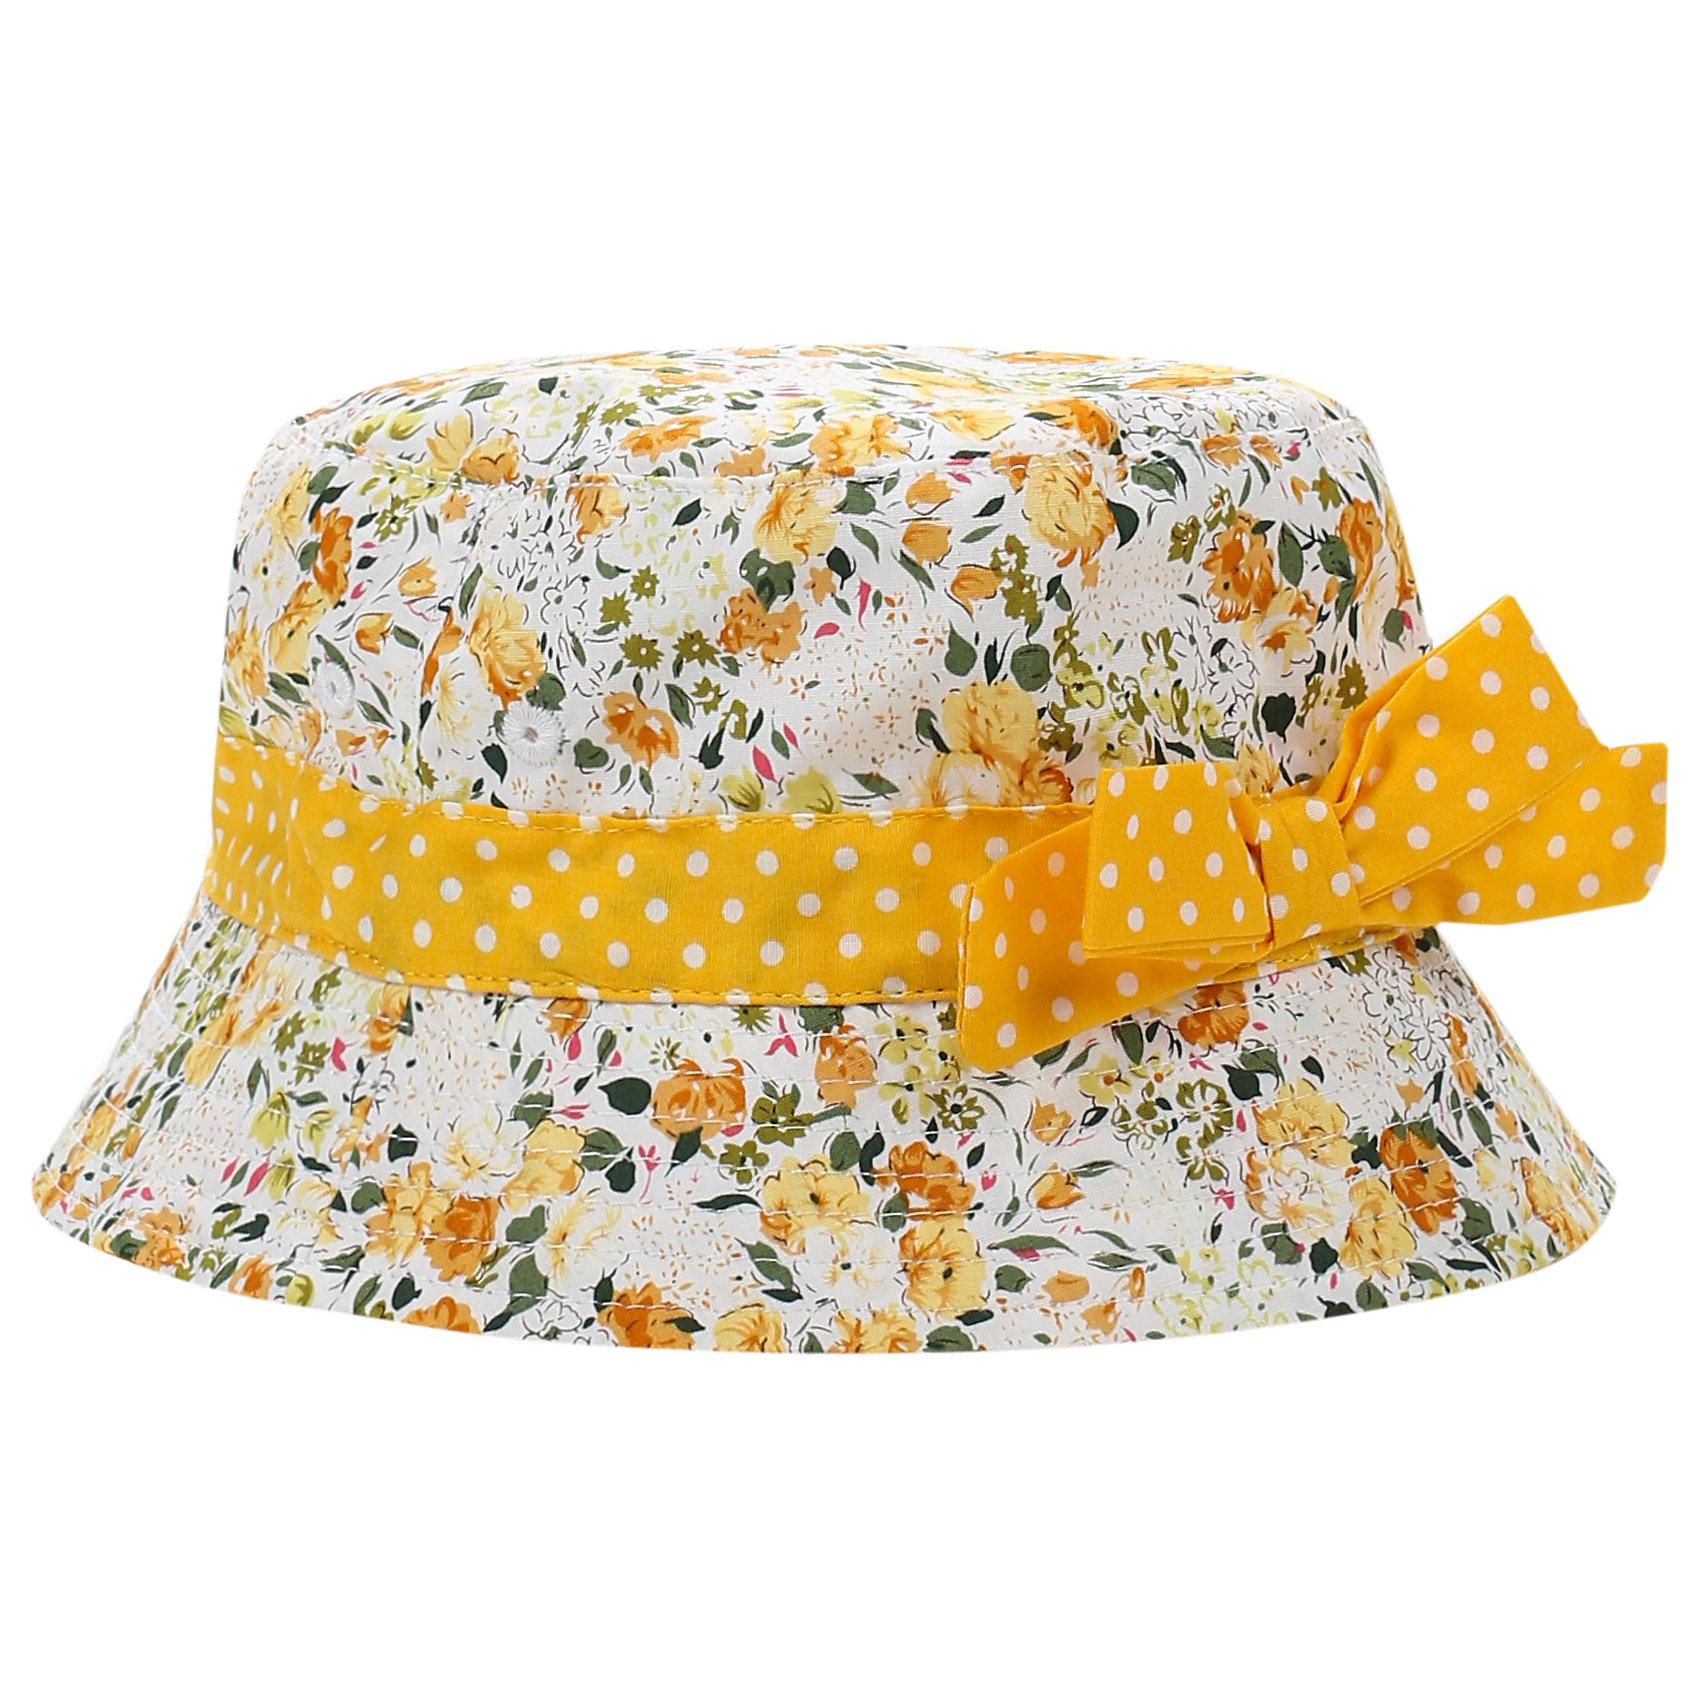 Шляпа для девочки Finn FlareШляпа для девочки от известного бренда Finn Flare<br>Фактура материала:Текстильный<br>Вид застежки:<br> <br> Тип карманов:<br>Состав:<br>100% хлопок 100% хлопок<br><br>Ширина мм: 89<br>Глубина мм: 117<br>Высота мм: 44<br>Вес г: 155<br>Цвет: белый<br>Возраст от месяцев: 60<br>Возраст до месяцев: 84<br>Пол: Женский<br>Возраст: Детский<br>Размер: 54,52<br>SKU: 4835633